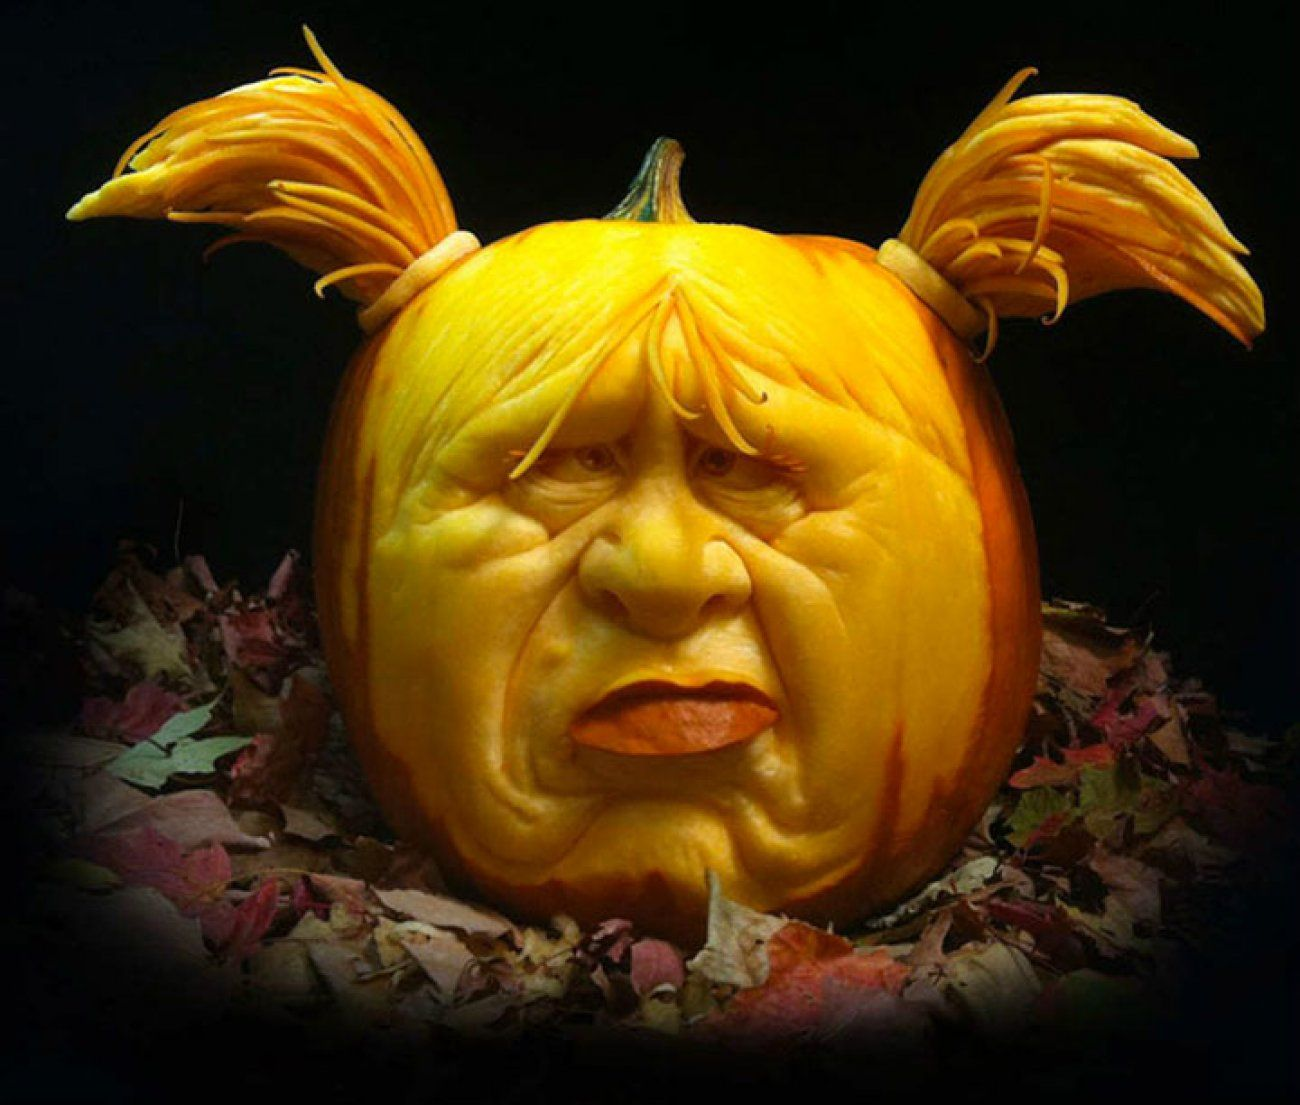 Citrouille Halloween Sculpture.Pin Von Louisa Auf Jeux De Nouriture Halloween Kurbis Schnitzen Kurbis Schnitzen Schablone Kurbisse Schnitzen